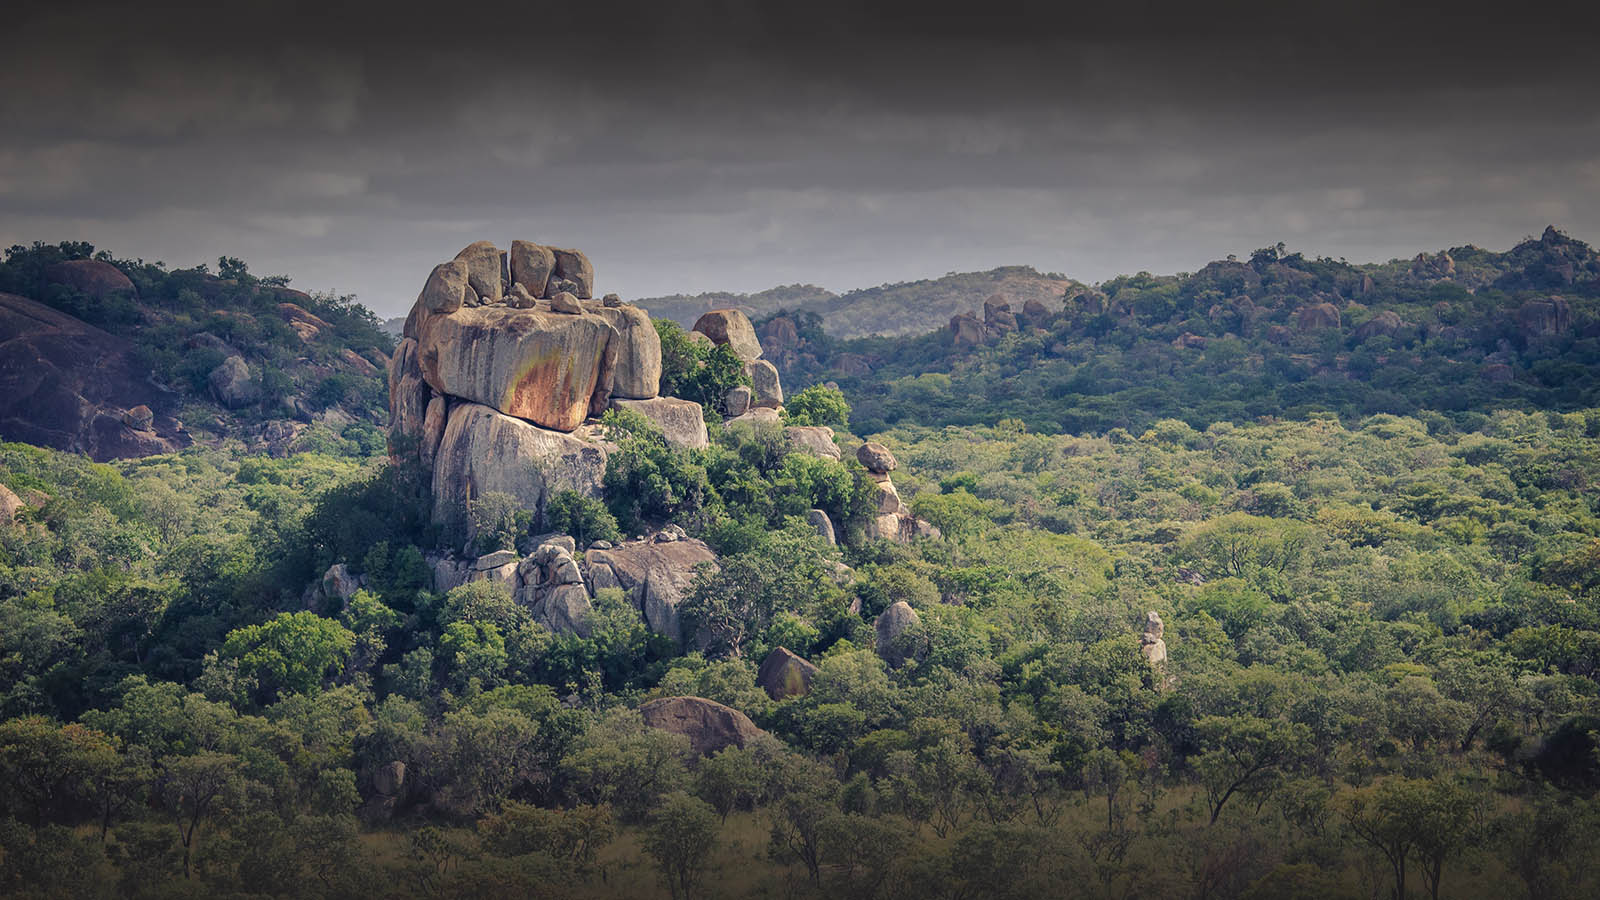 big cave camp matobo-hills-national-park-zimbabwe-rocks-mountains